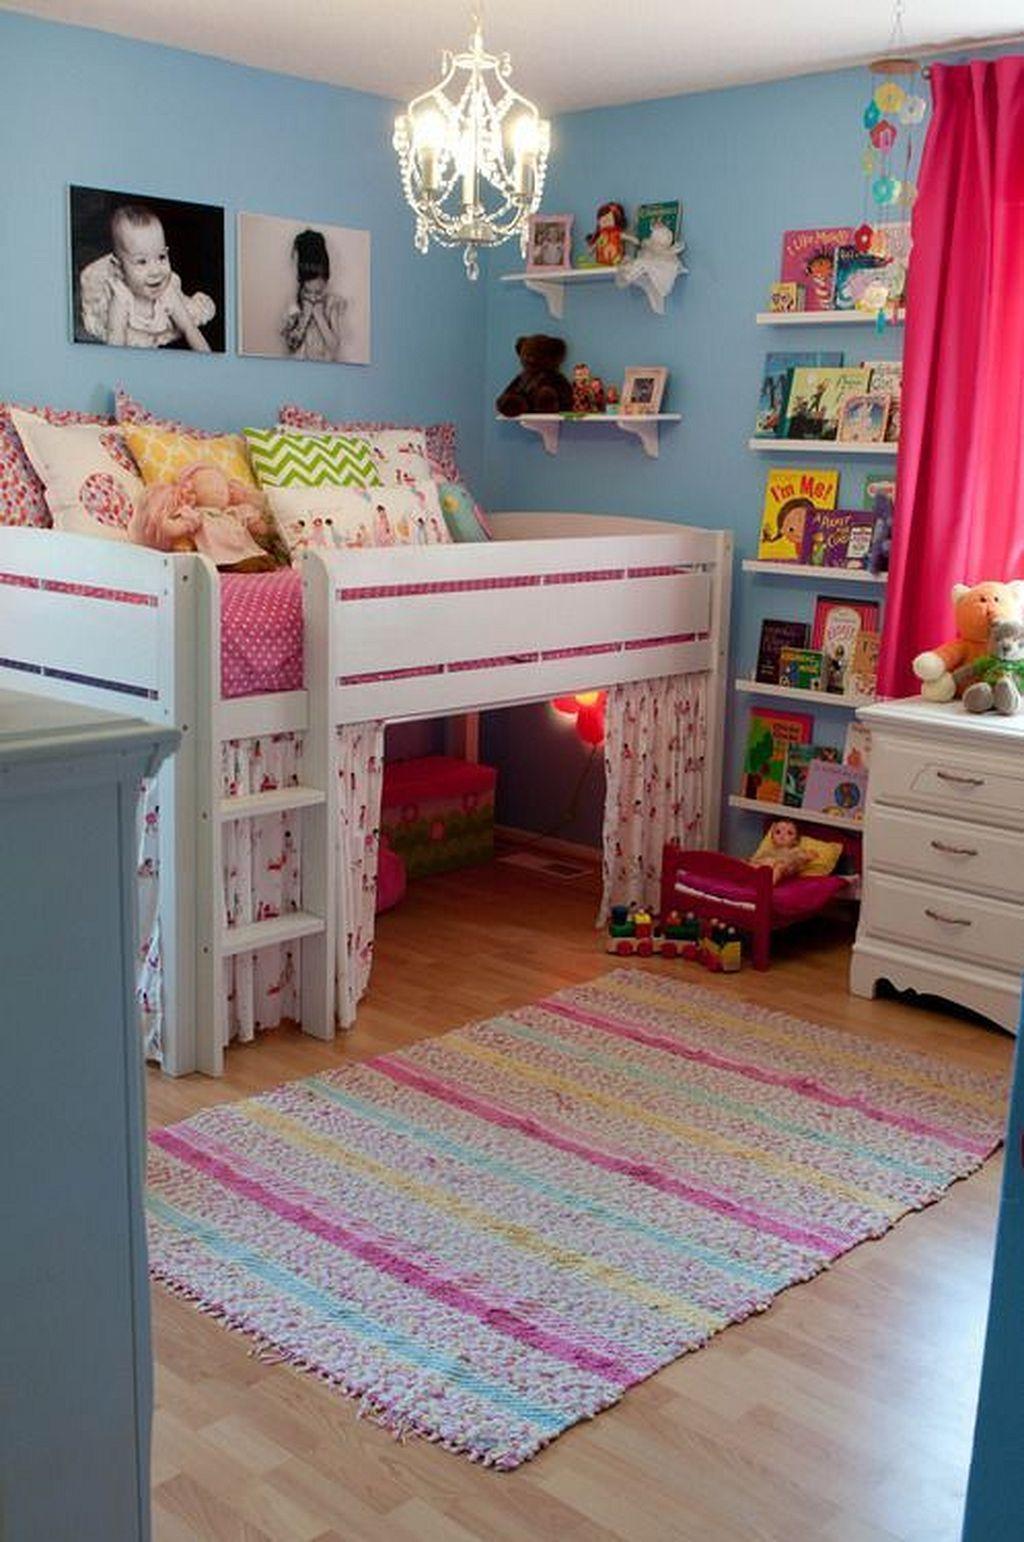 Loft bed with desk south africa   Best Girl Kids Room Ideas   Kids rooms Room ideas and Room